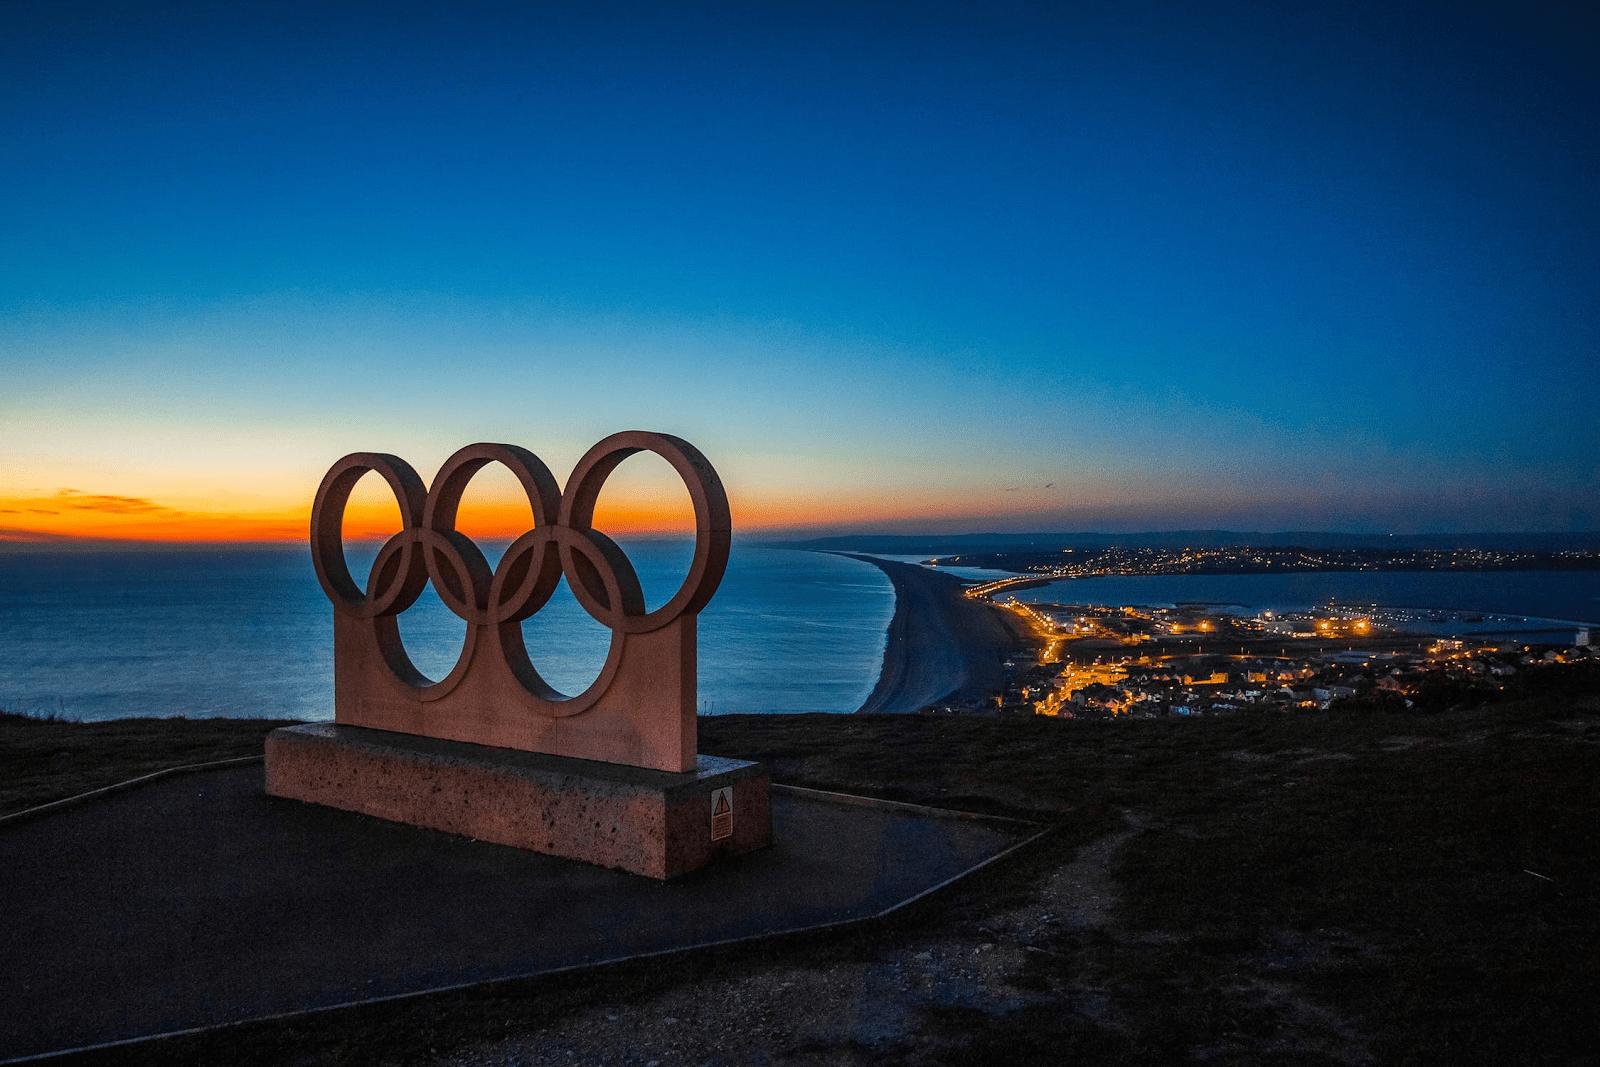 Surfing games Olympics Paris 2024